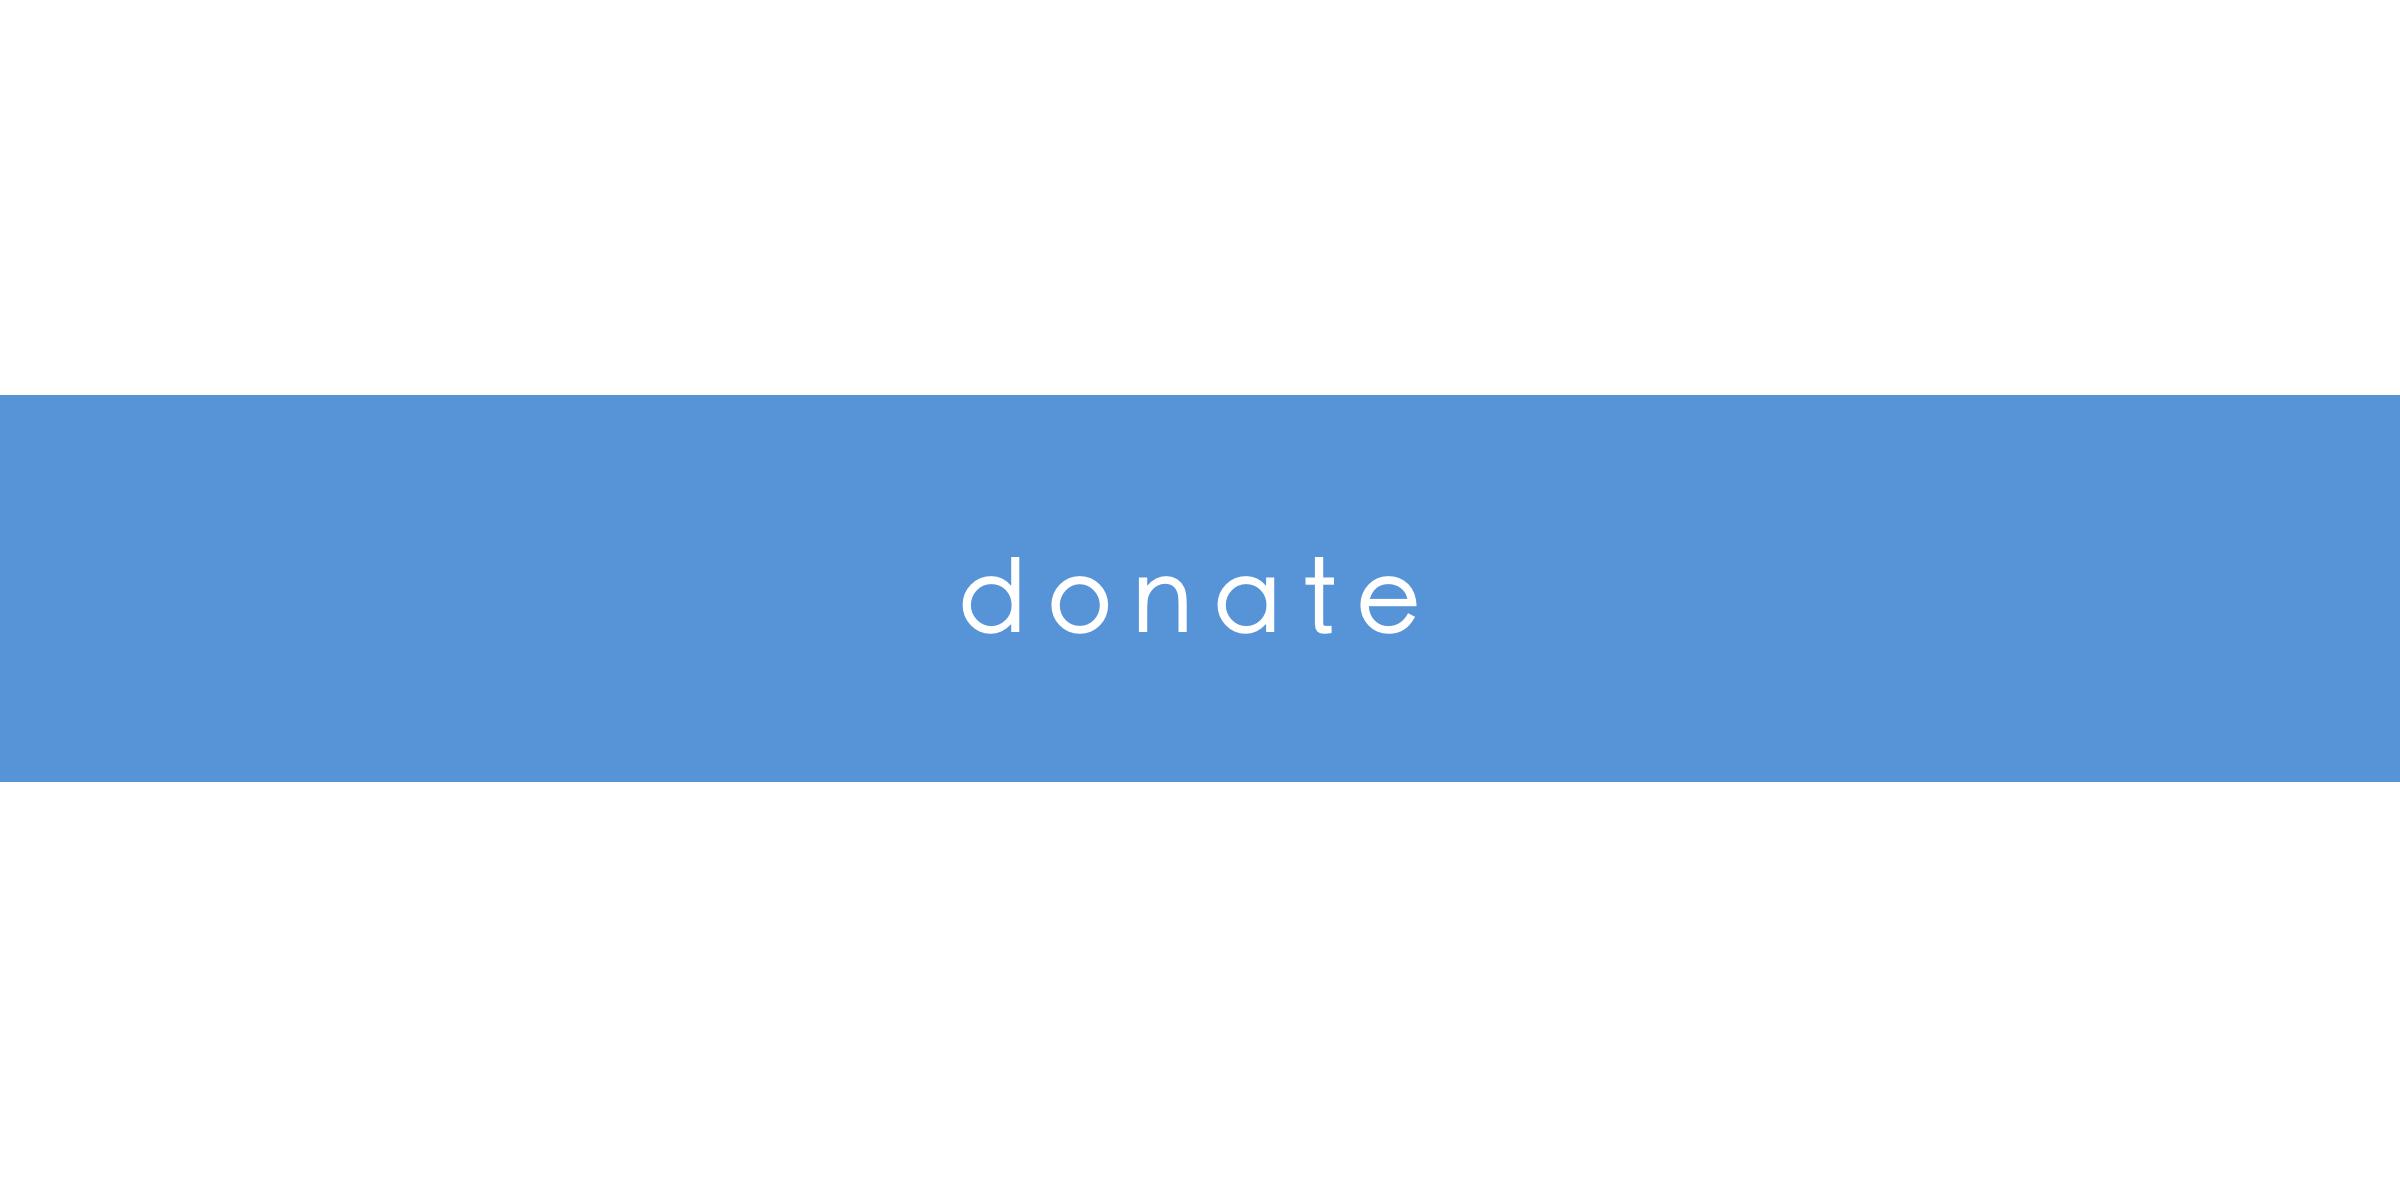 00007-Trans-donate button.jpg